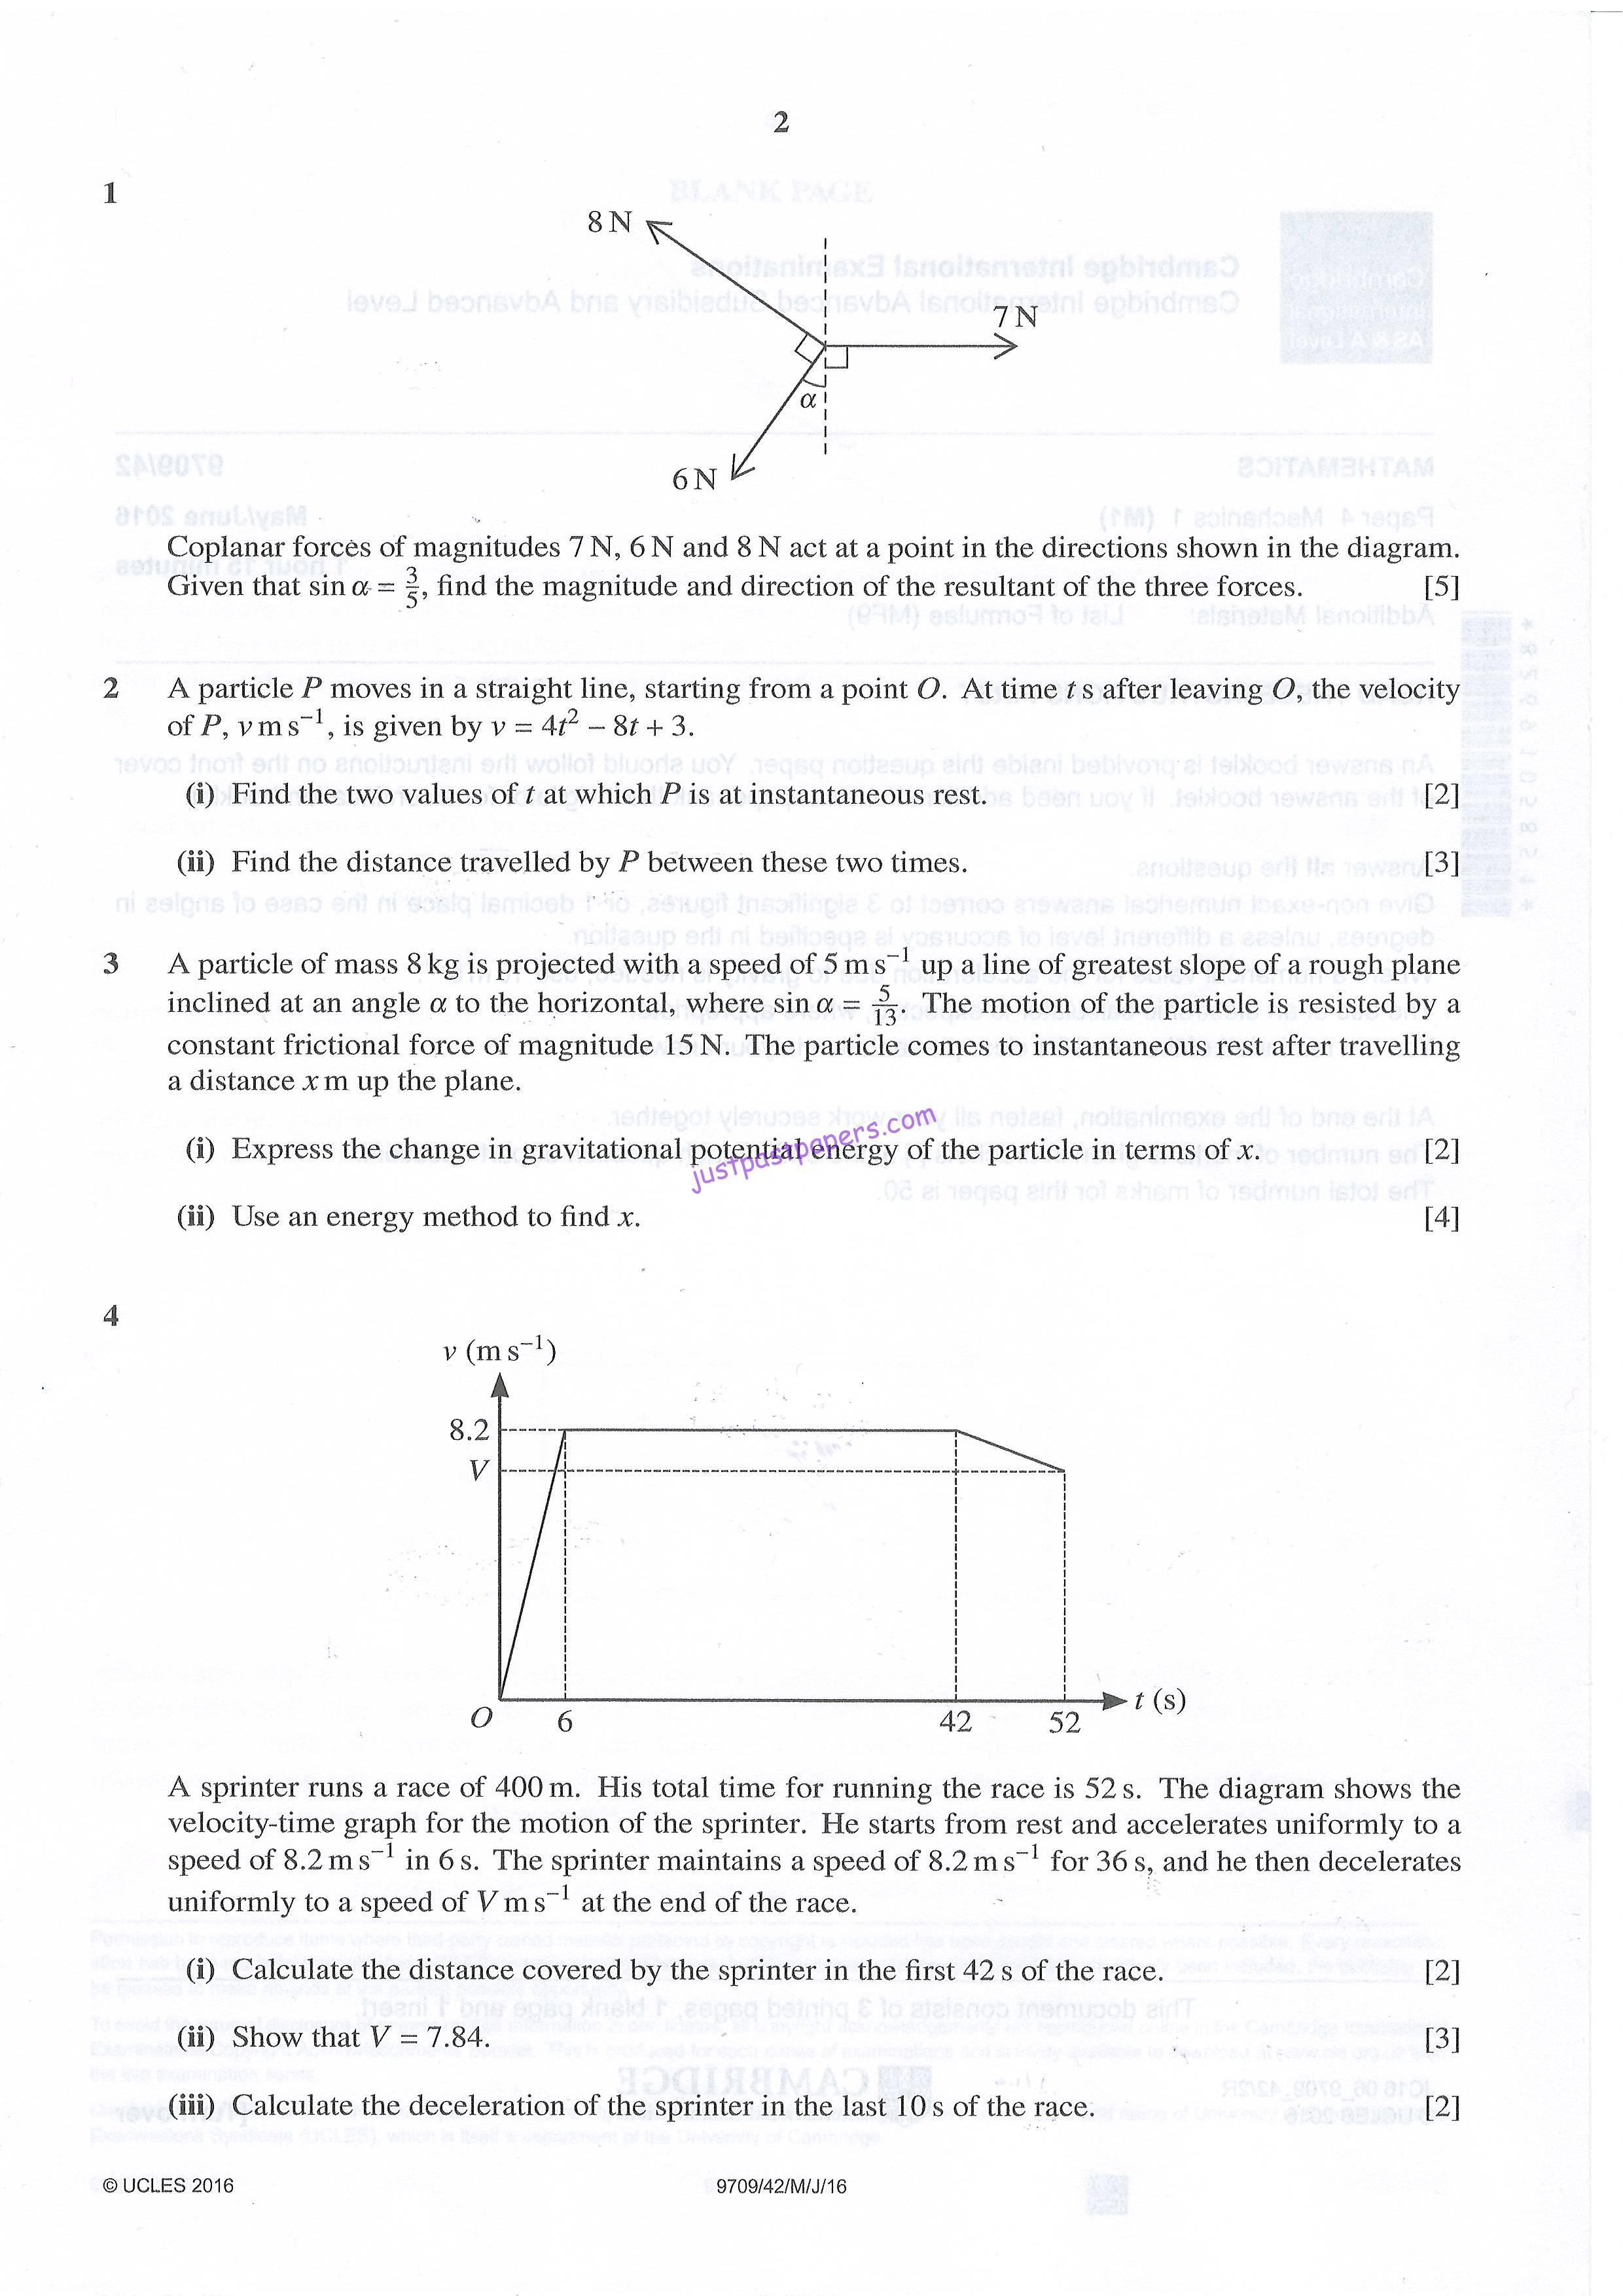 CIE – 9709 MATHEMATICS, Mechanics 1, A LEVEL, PAPER 4, MAY